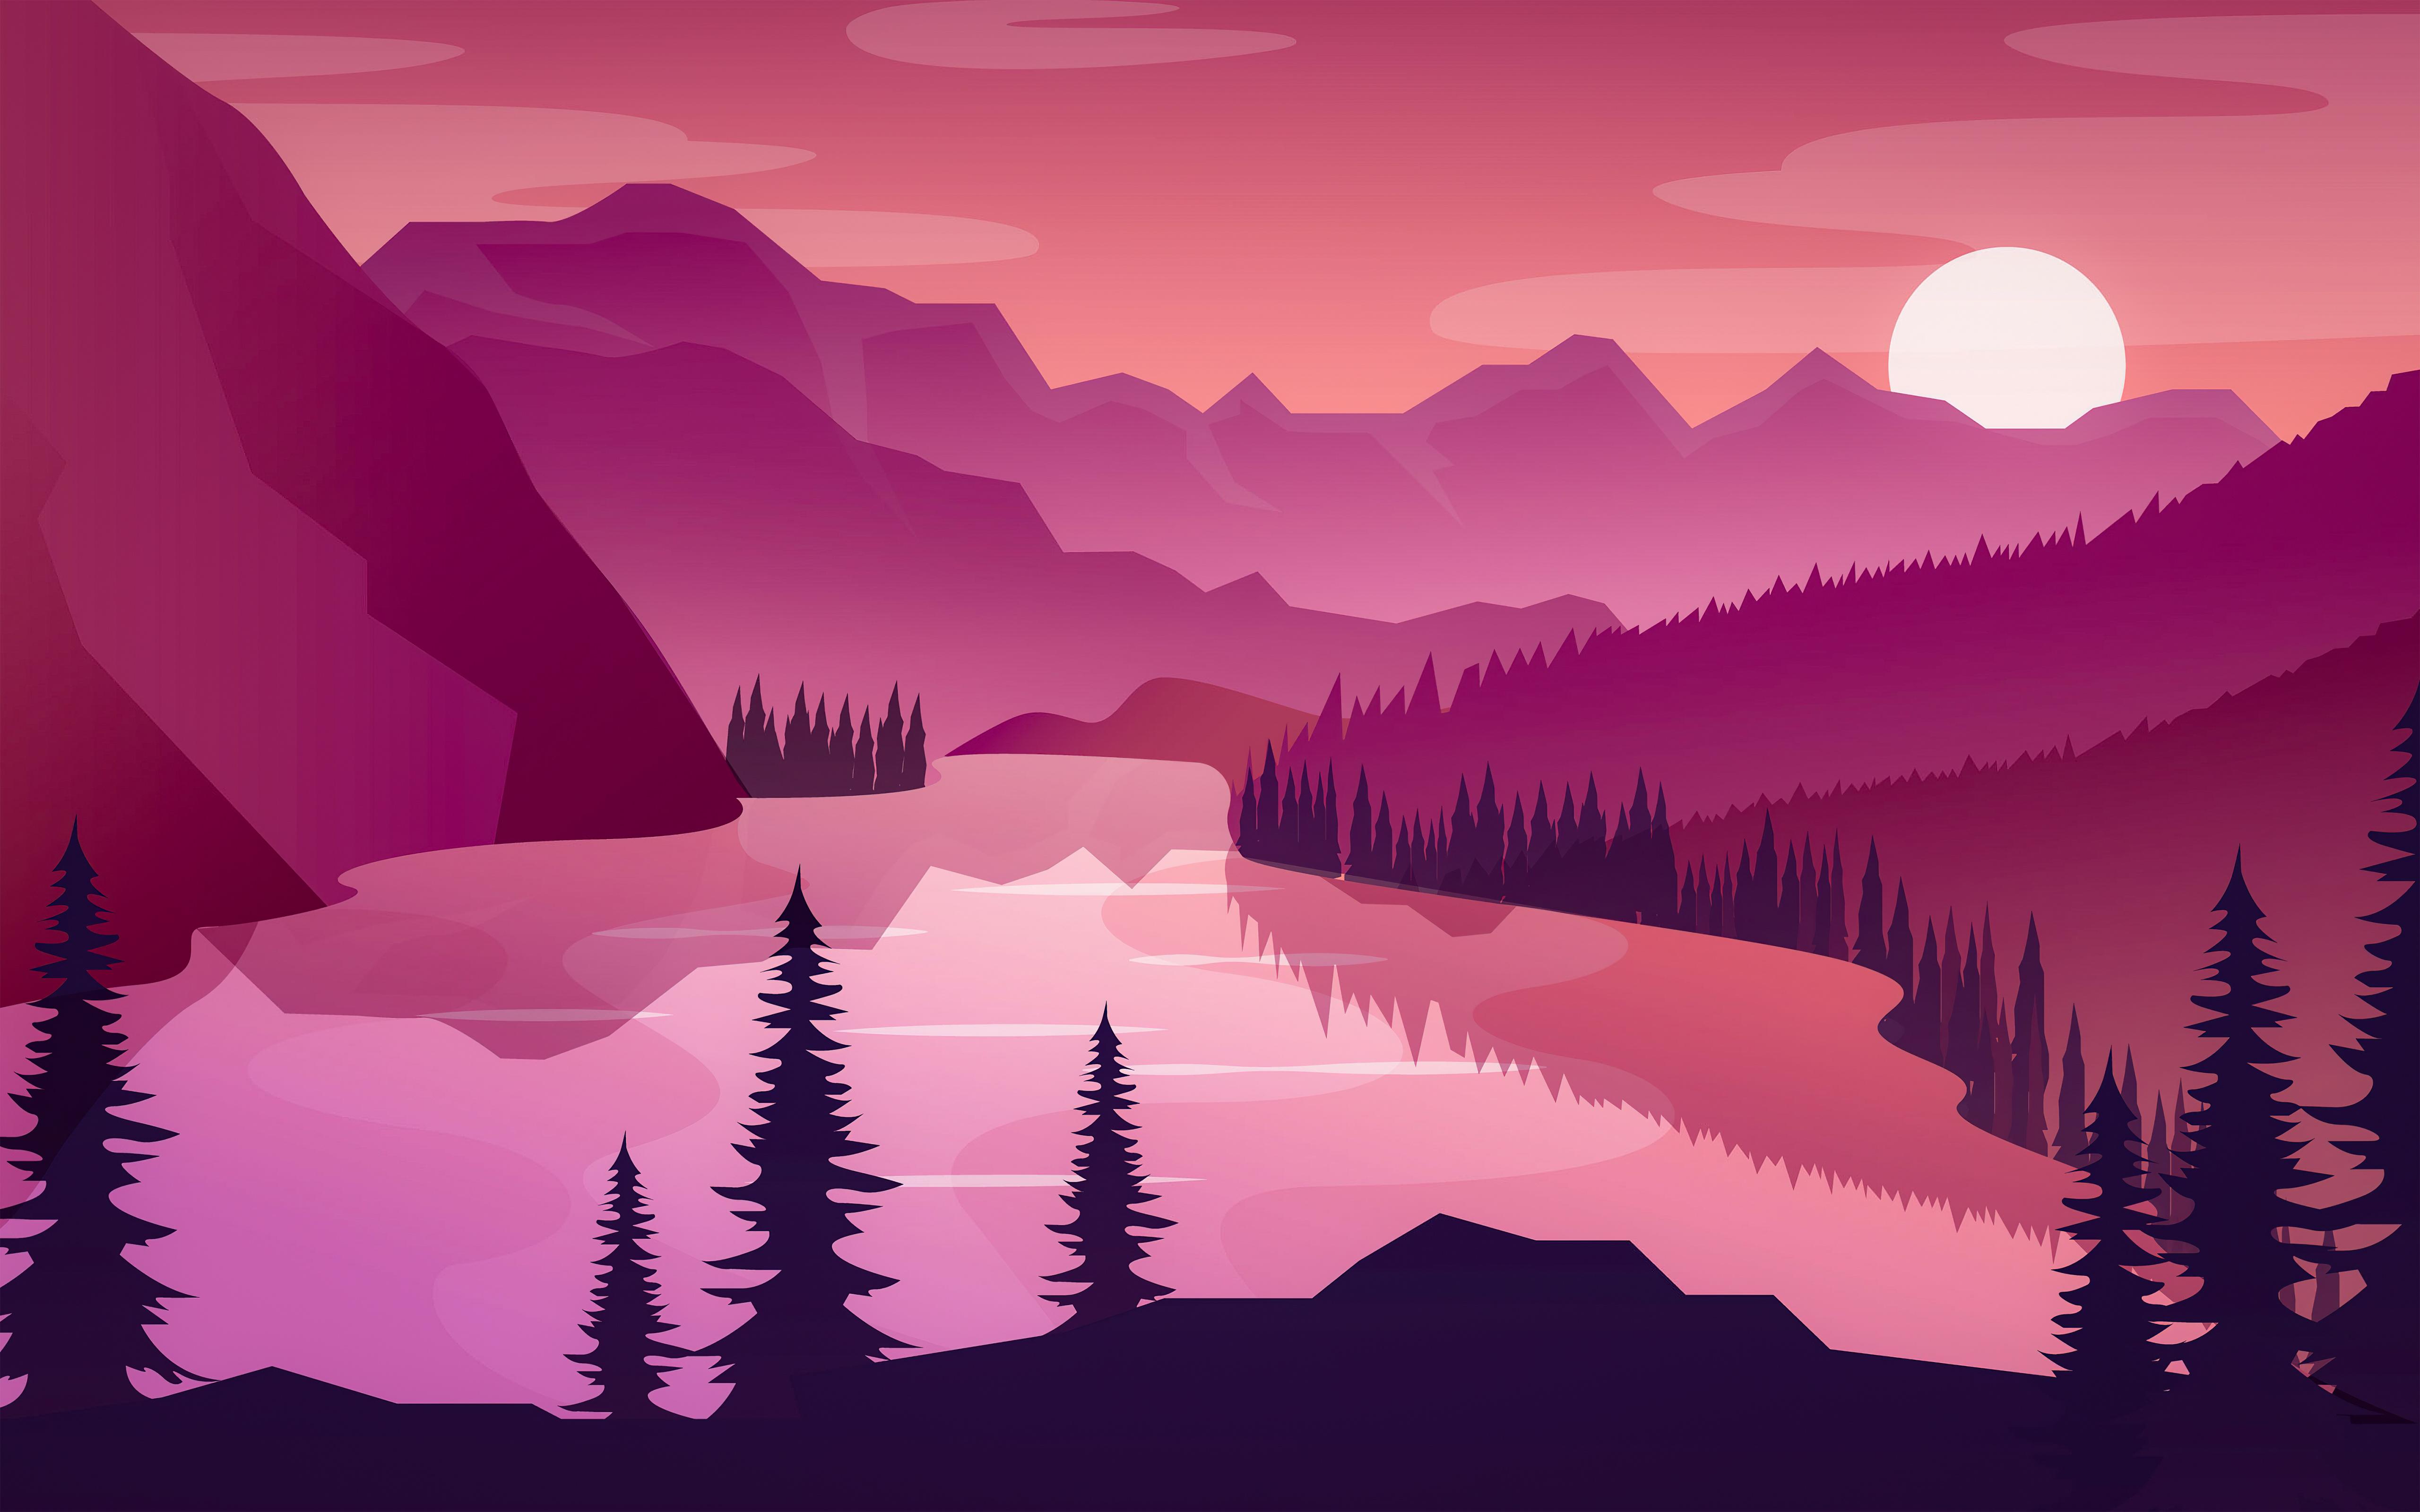 flat minimal morning landscape lake 4k 1618133461 - Flat Minimal Morning Landscape Lake 4k - Flat Minimal Morning Landscape Lake 4k wallpapers